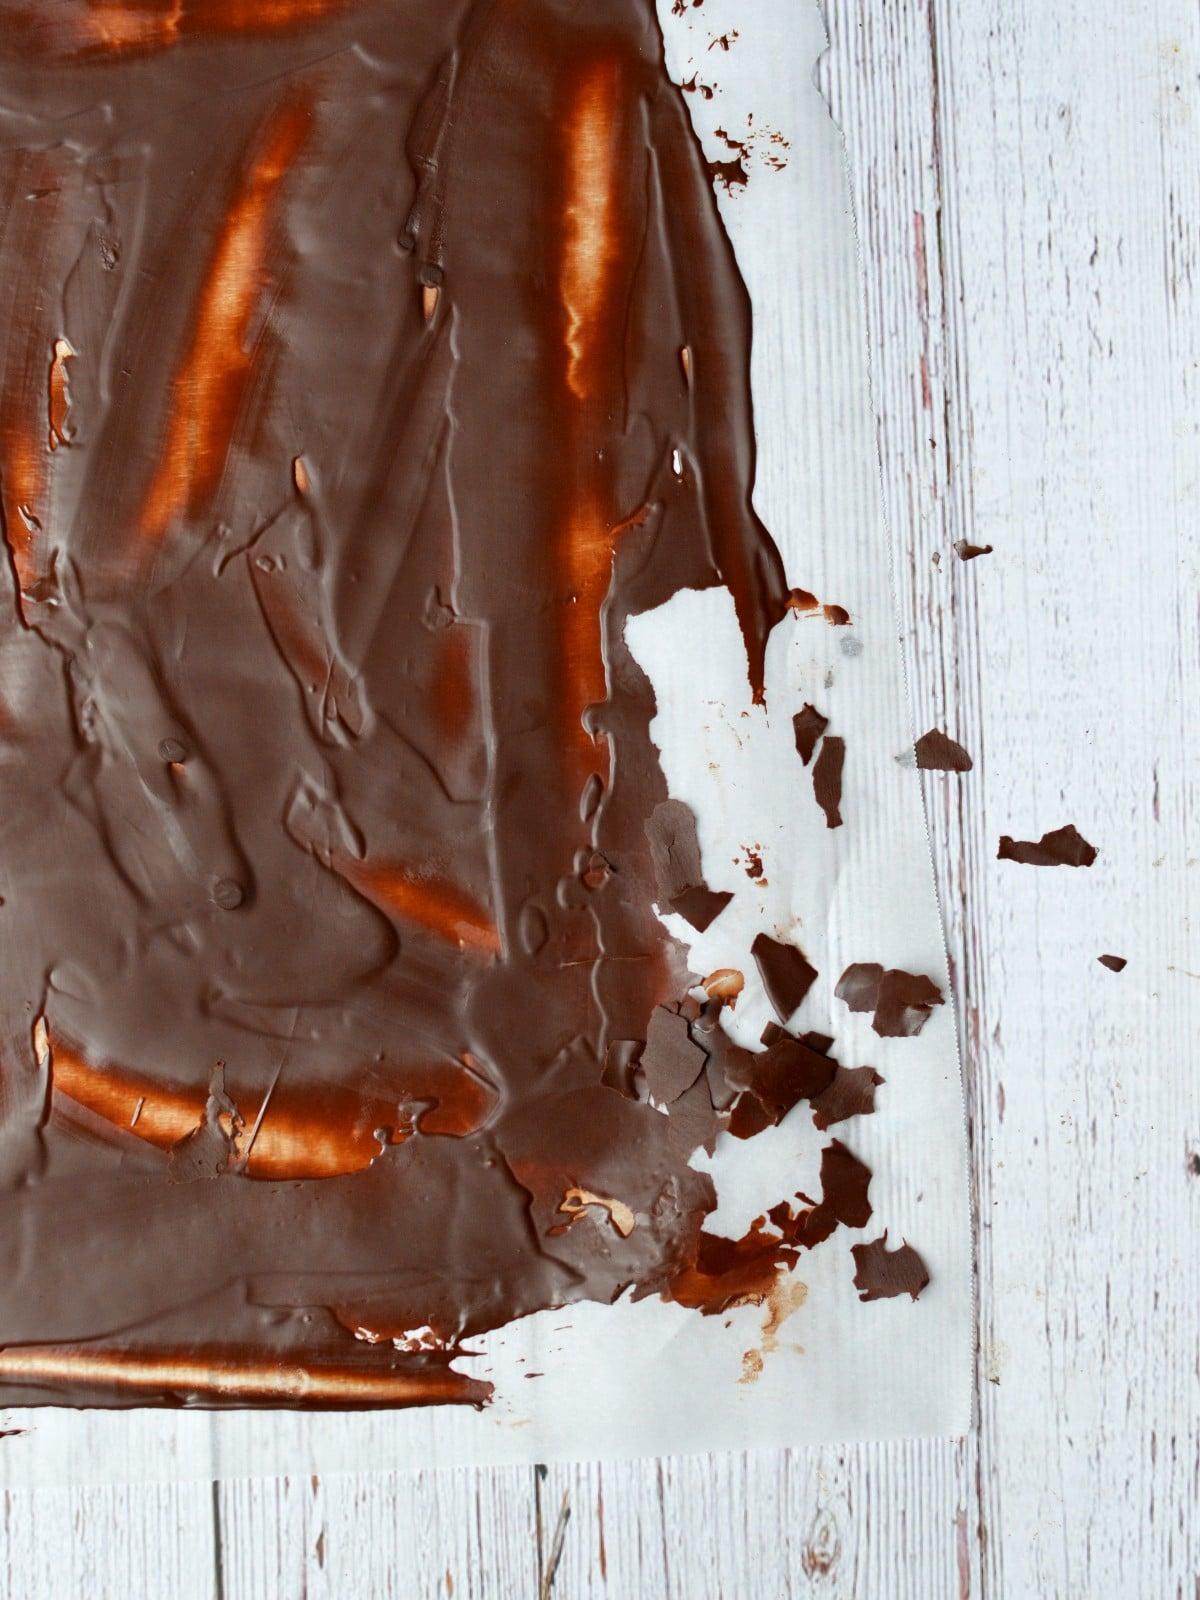 chocolate flakes